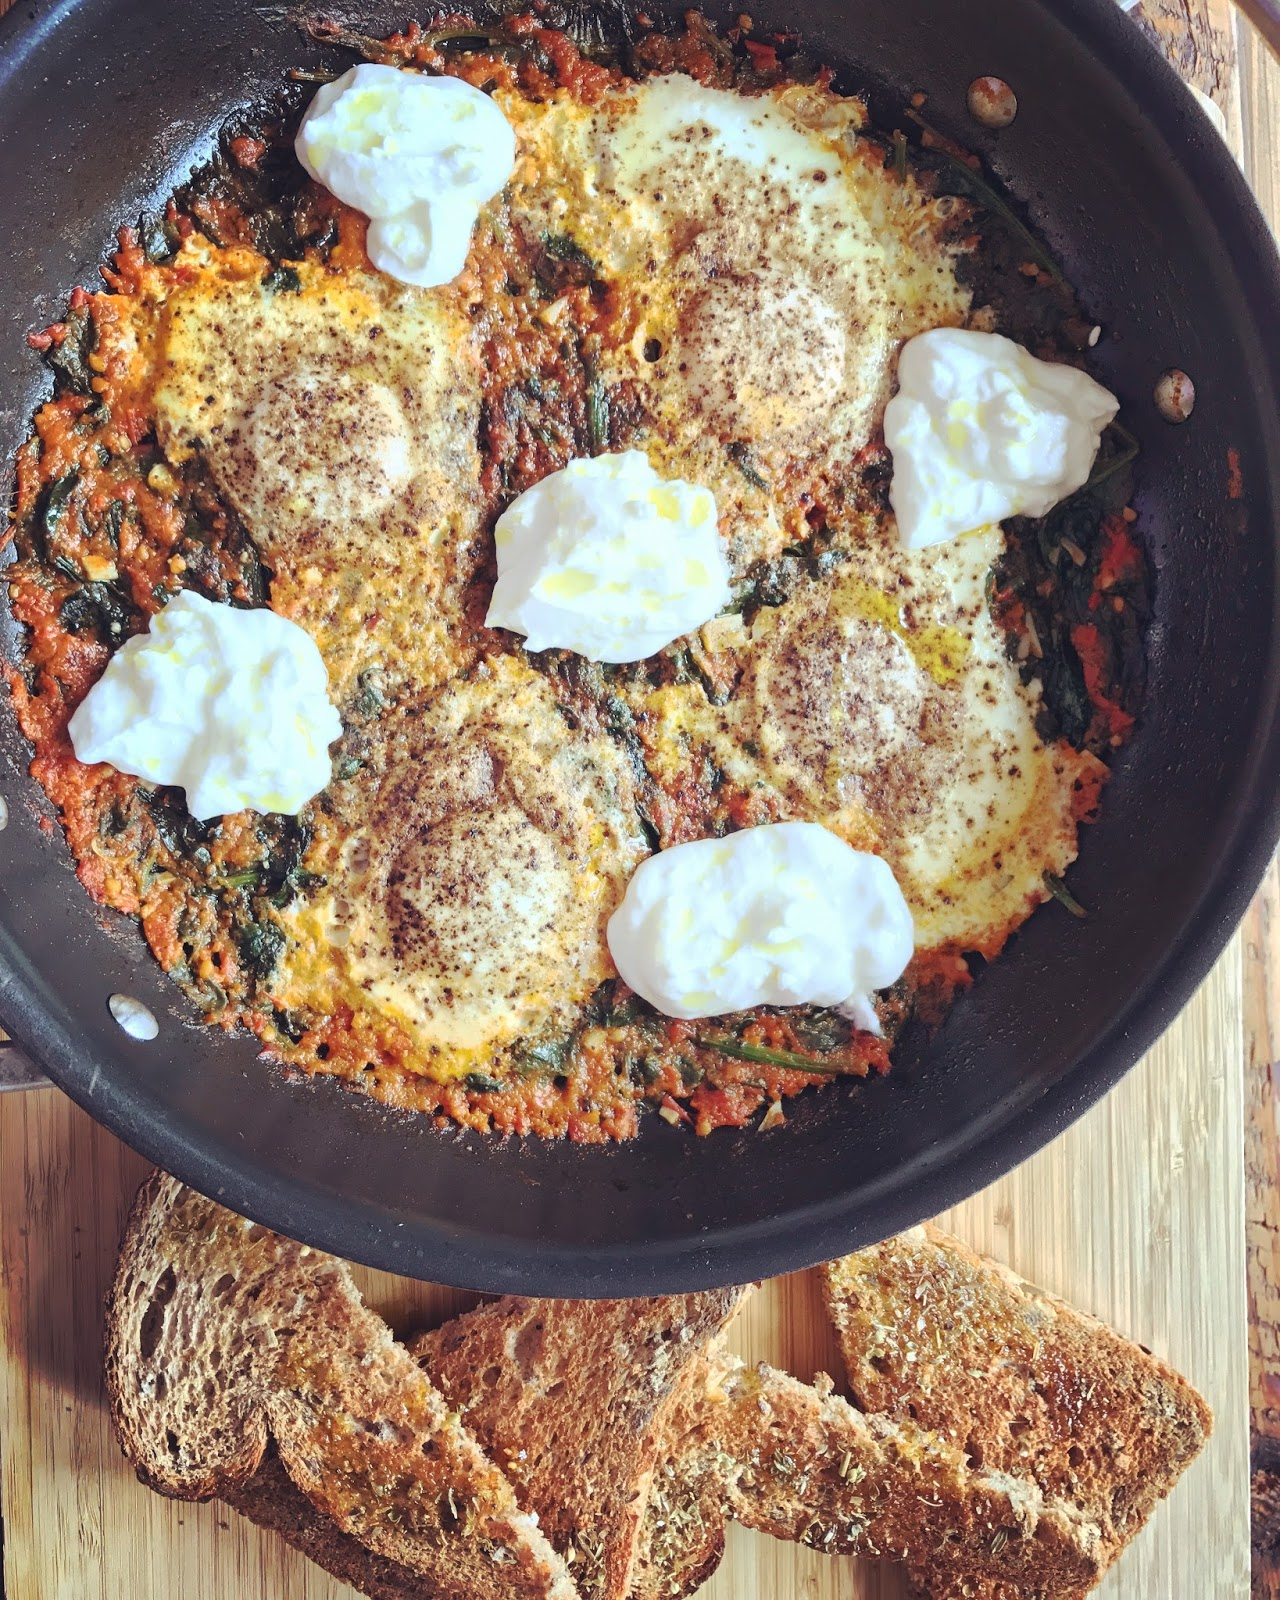 Sunday Brunch - Mediterranean Eggs with Spinach and Greek